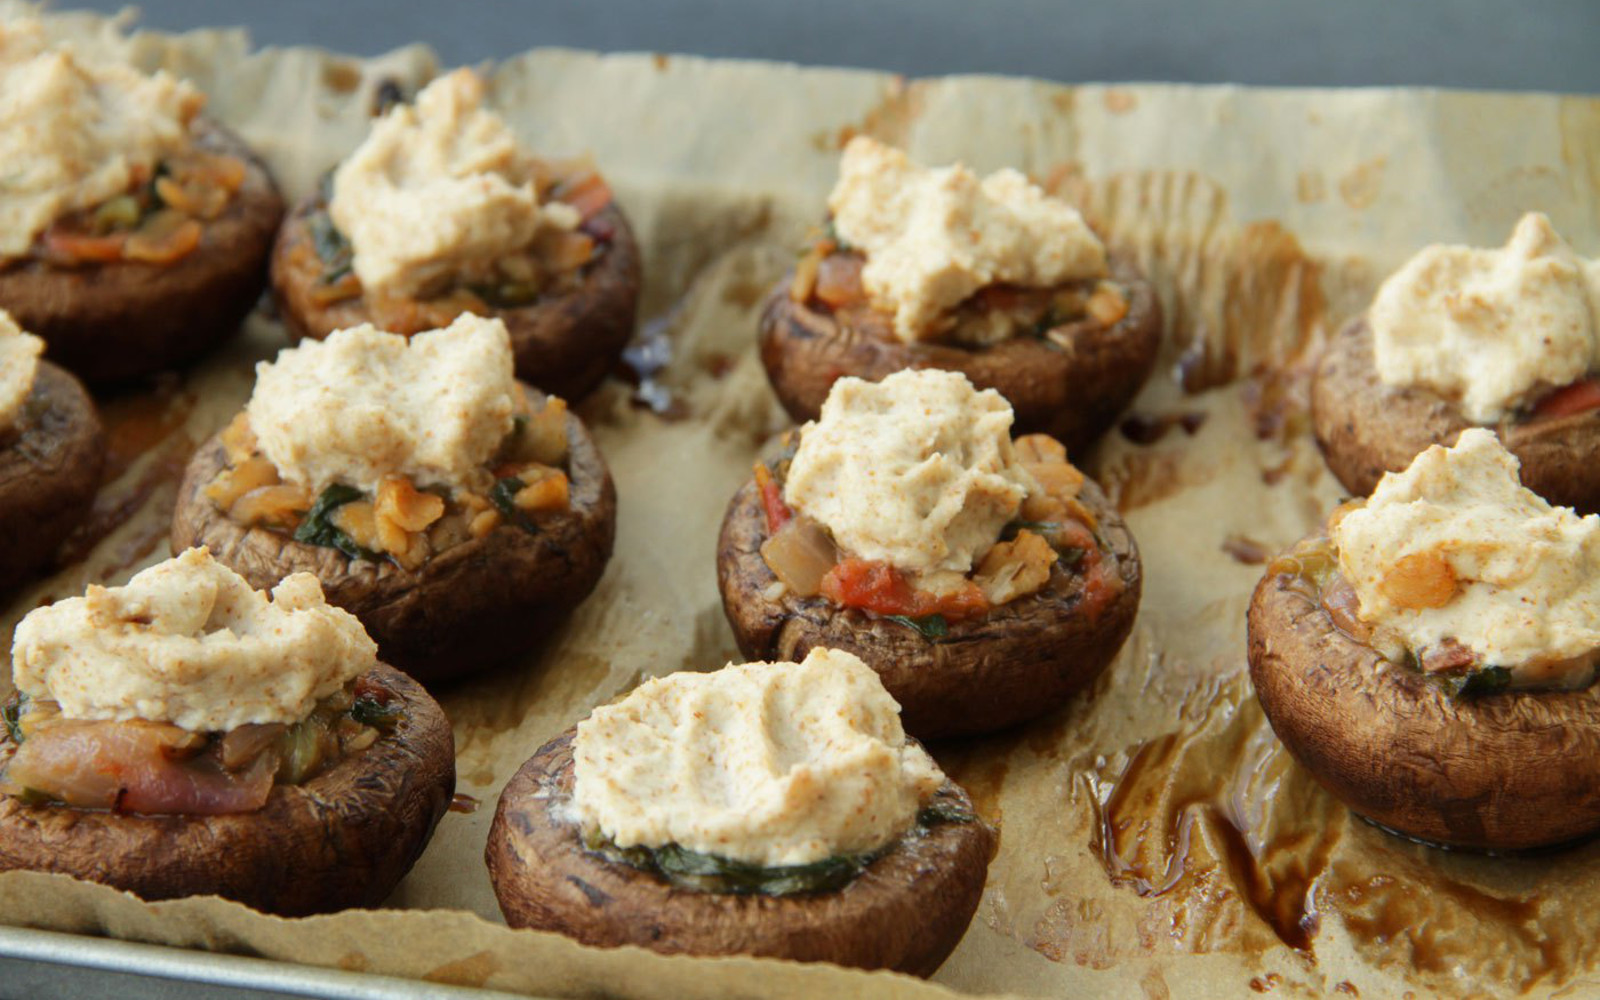 Stuffed Mushrooms With Almond Feta